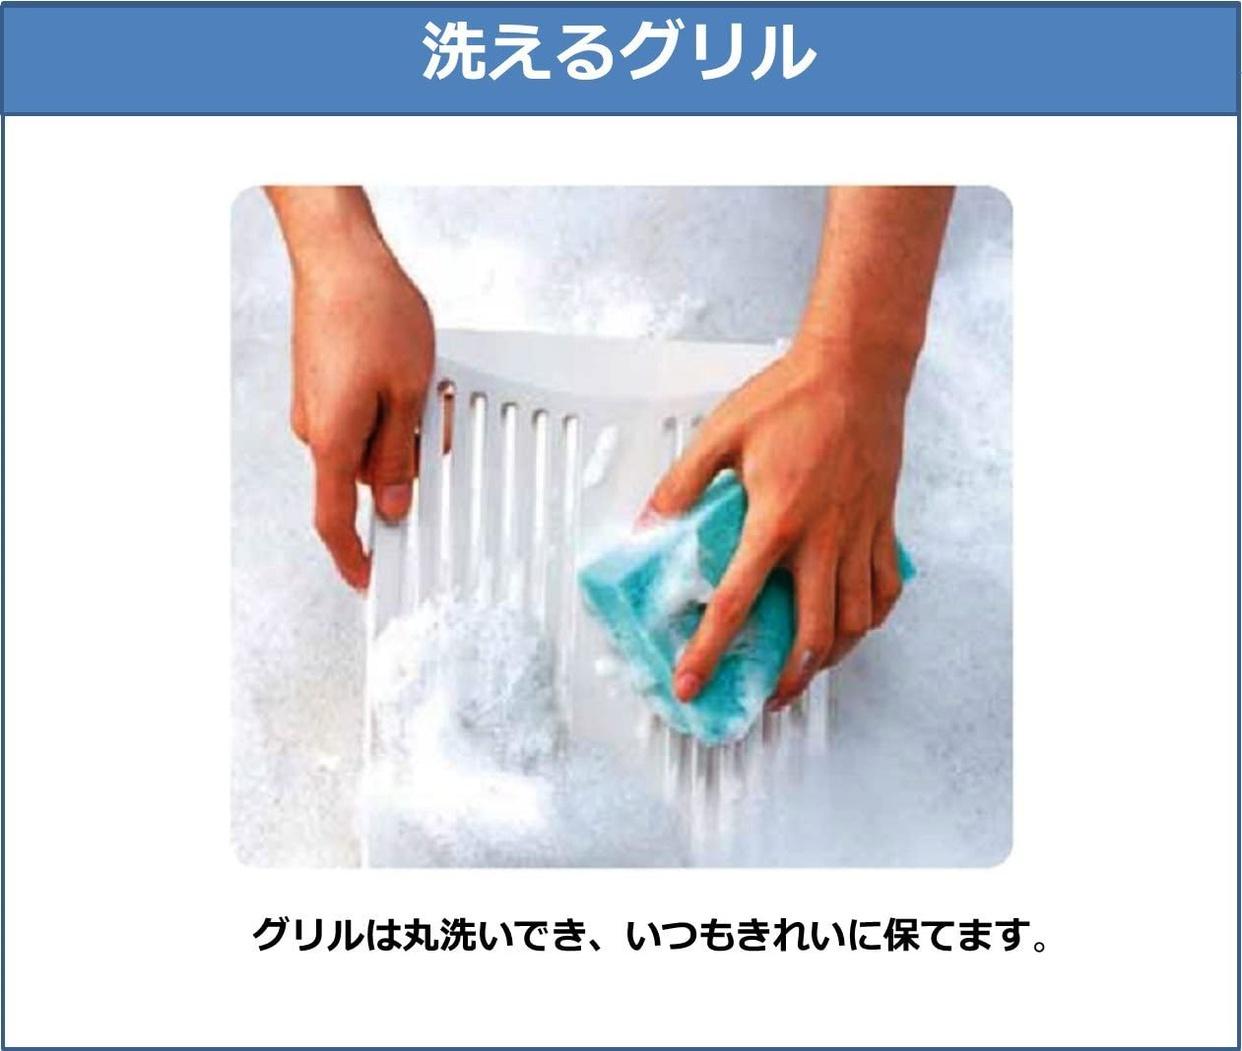 KOIZUMI(コイズミ) ルームエアコン KAW-1602/Wの商品画像4